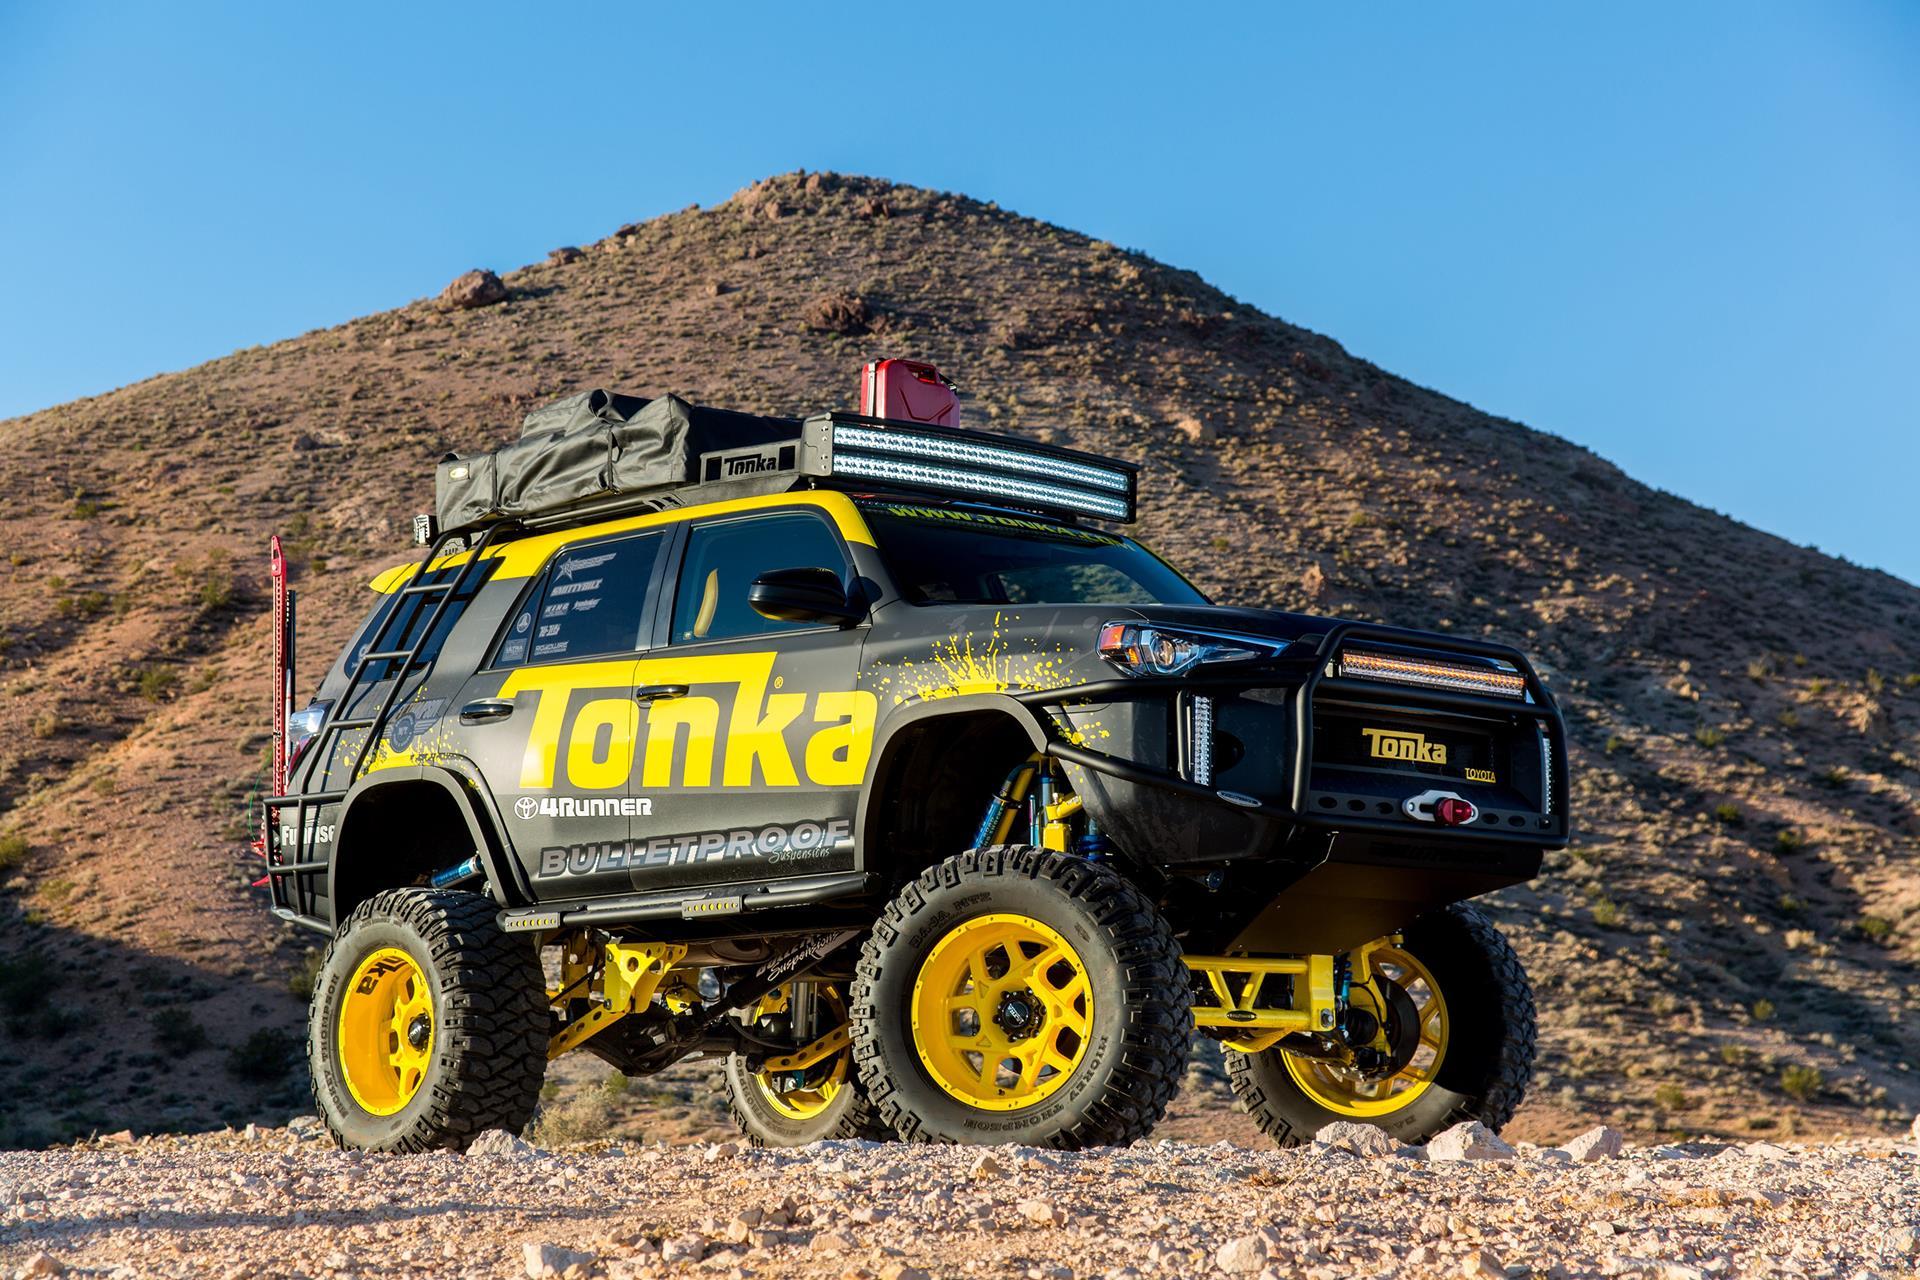 4runner Trd Pro Grill >> 2015 Toyota Tonka 4Runner News and Information